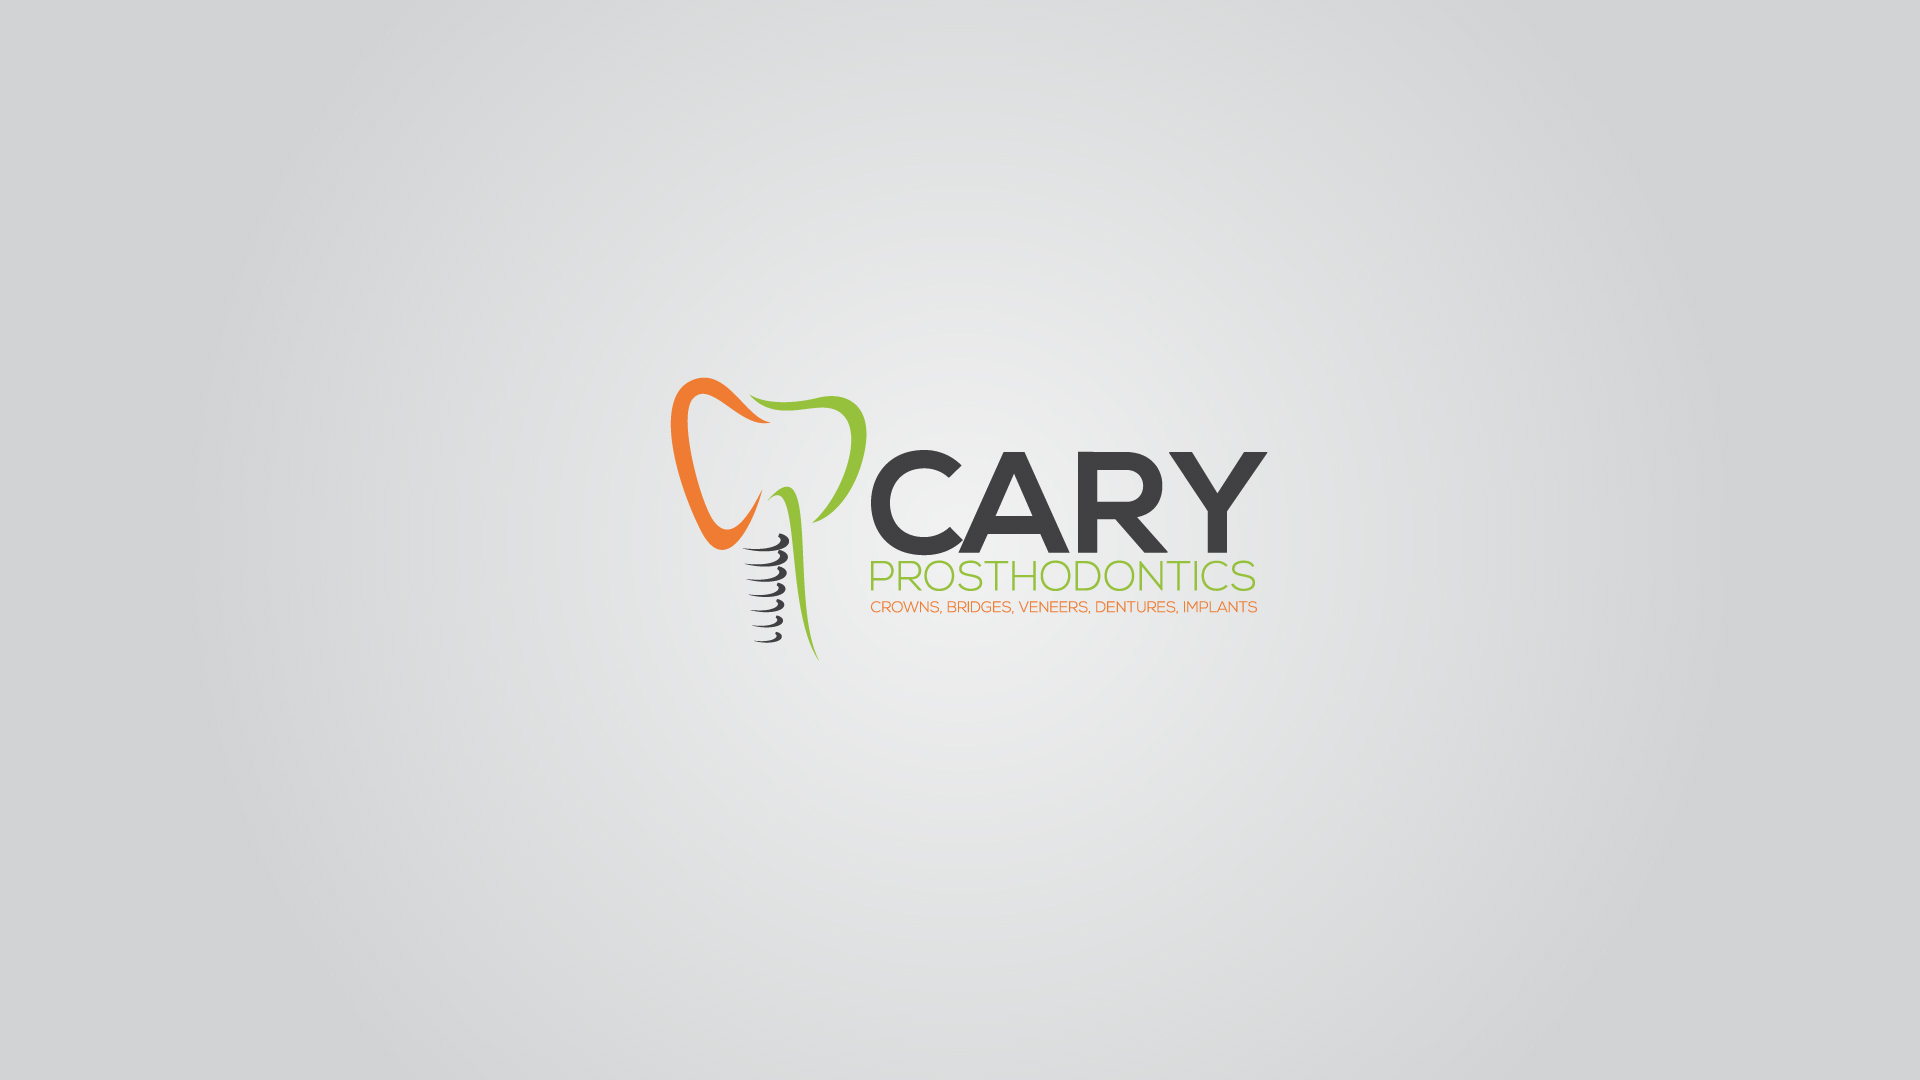 Logo Design by MD SHOHIDUL ISLAM - Entry No. 172 in the Logo Design Contest Cary Prosthodontics Logo Design.